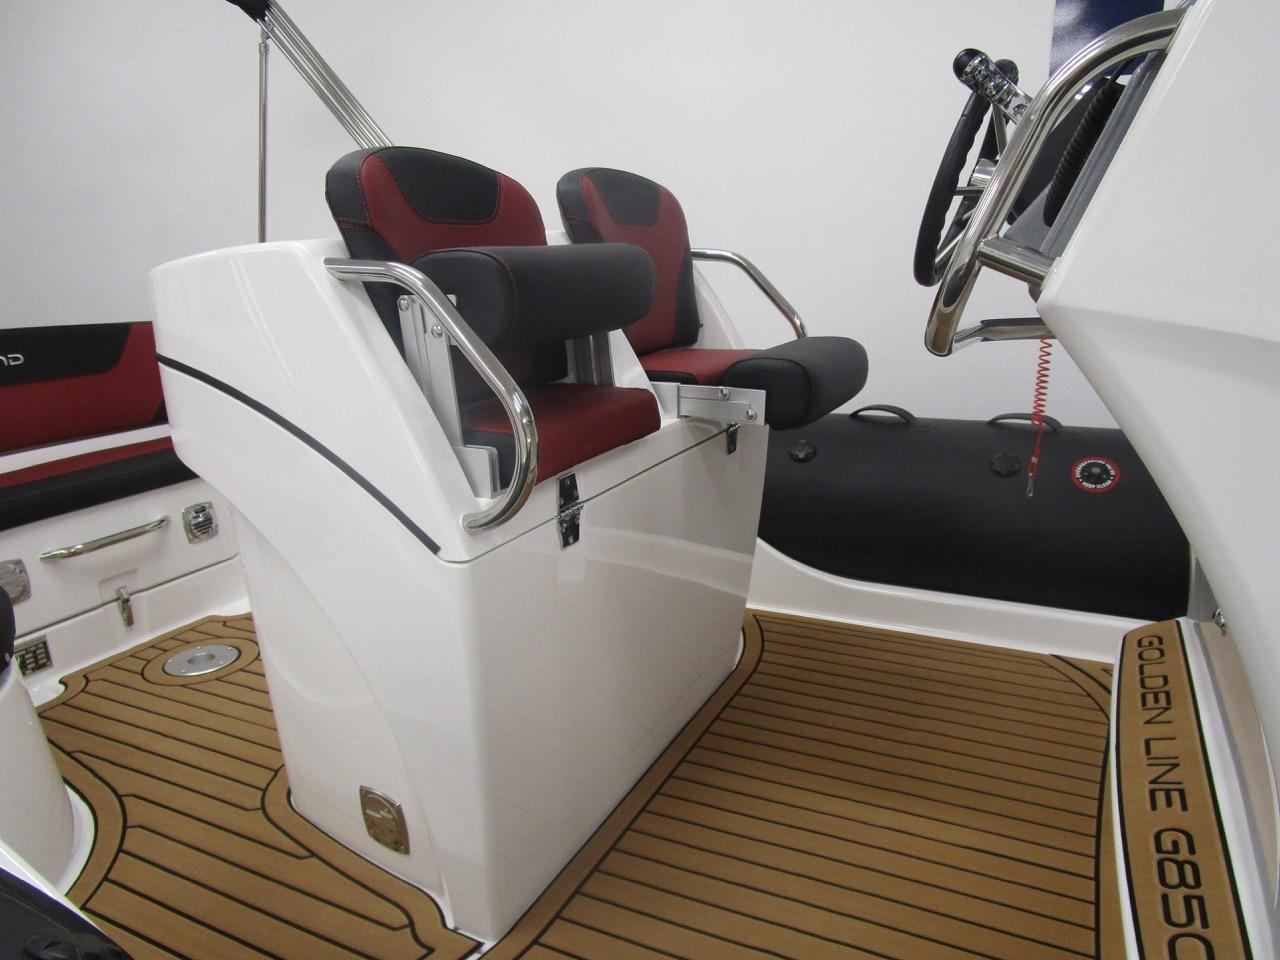 GRAND G850 RIB helm seats split